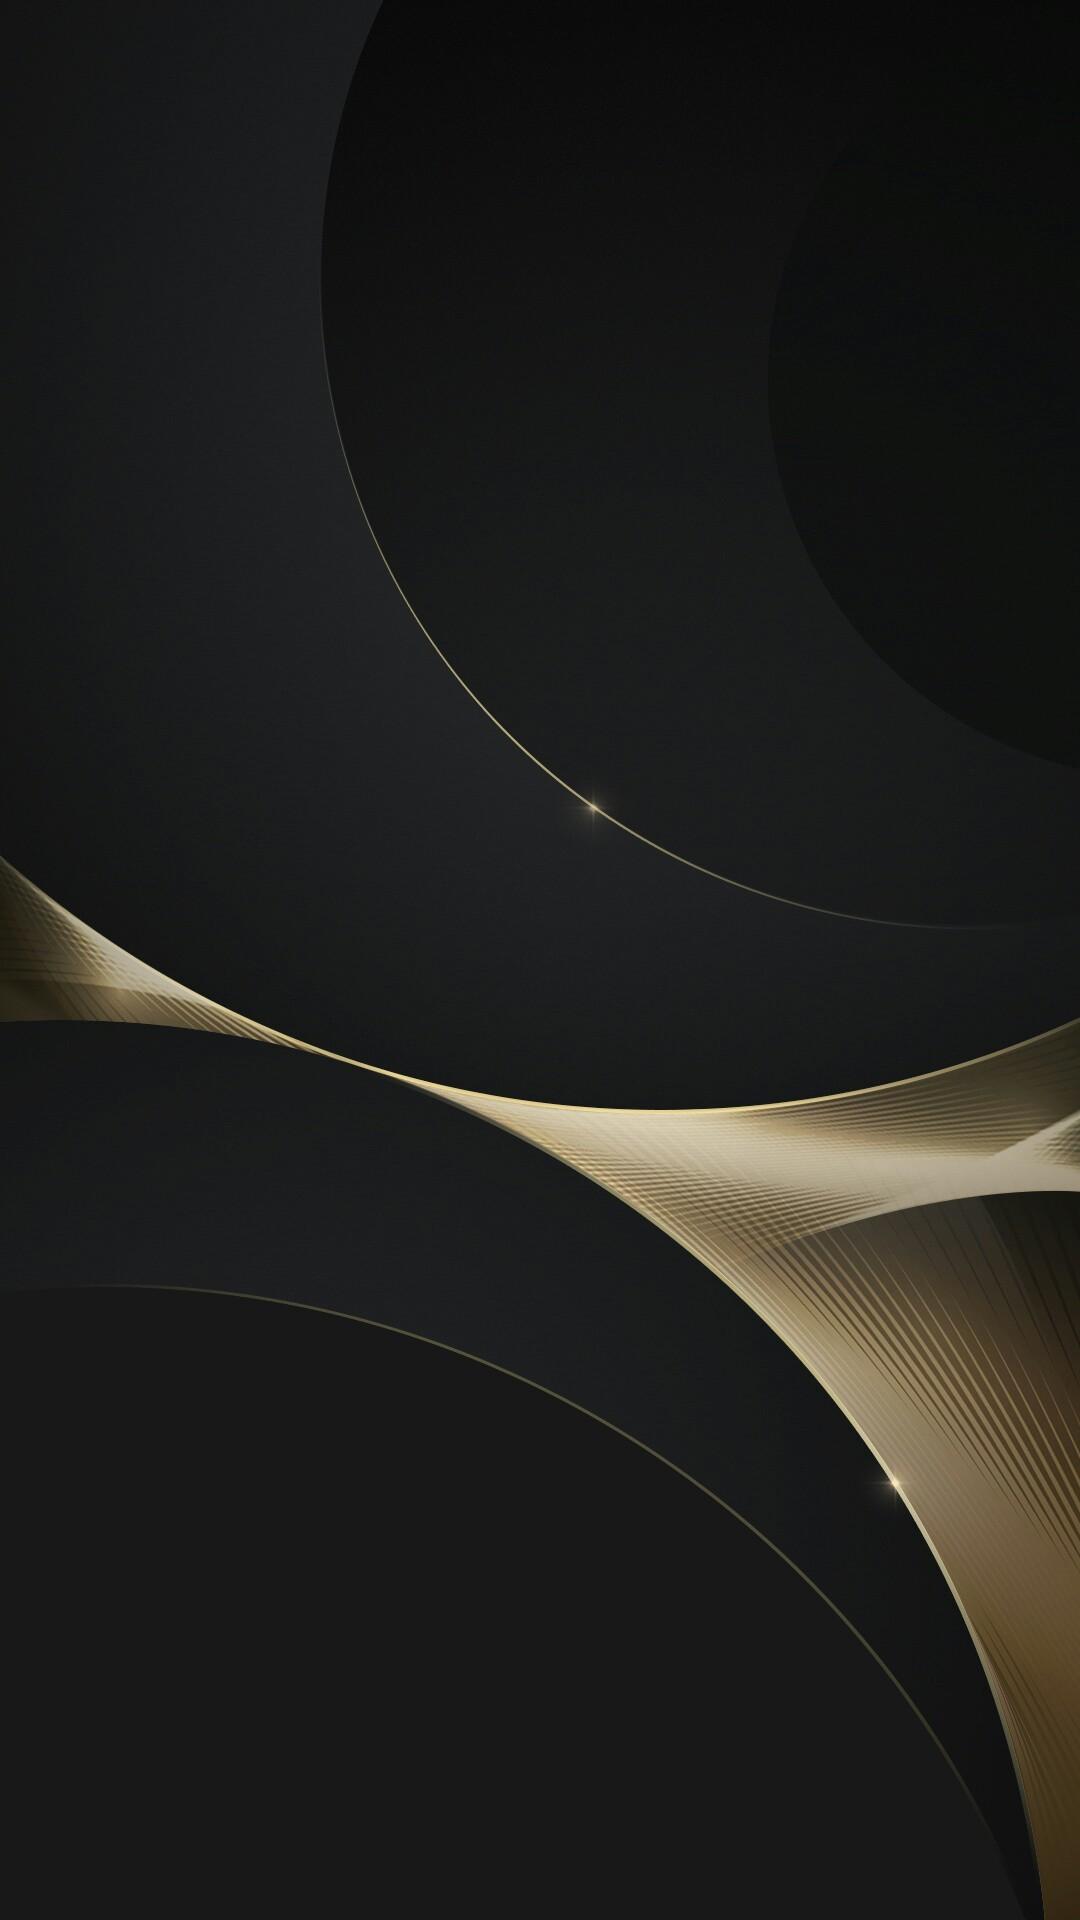 Wal Paper, Fantastic Wallpapers, Planner Dividers, Phone Backgrounds, Iphone  Wallpapers, Gold Wallpaper, Screensaver, Iphone Se, Repeat